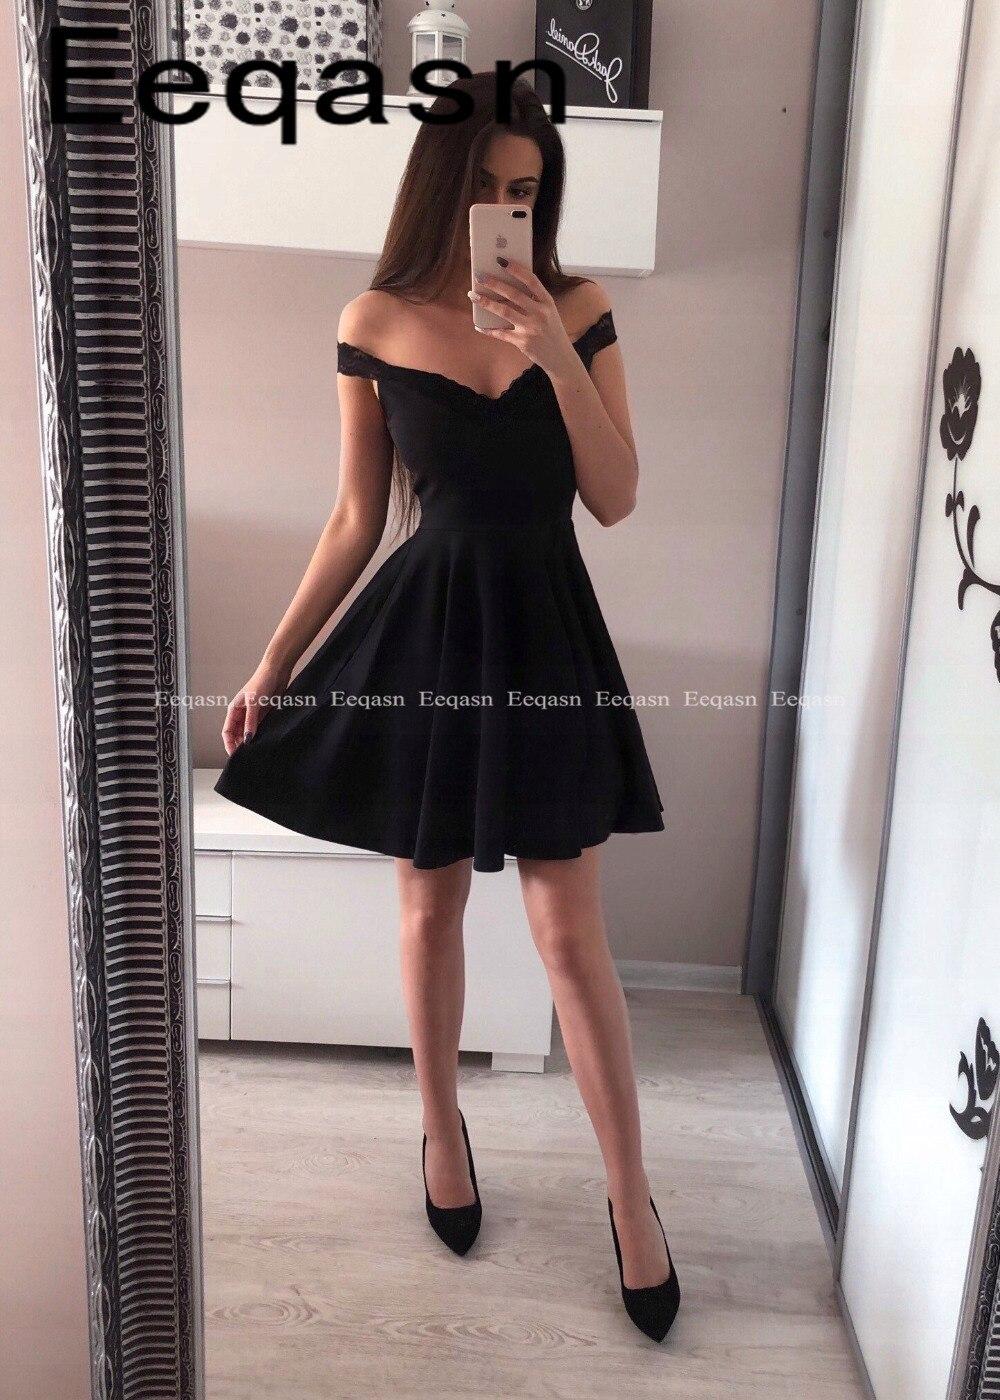 Hot A Line Off The Shoulder Lace V Neck Short Prom Dress Graduation Homecoming Dresses Chic Little Black Dress 2019